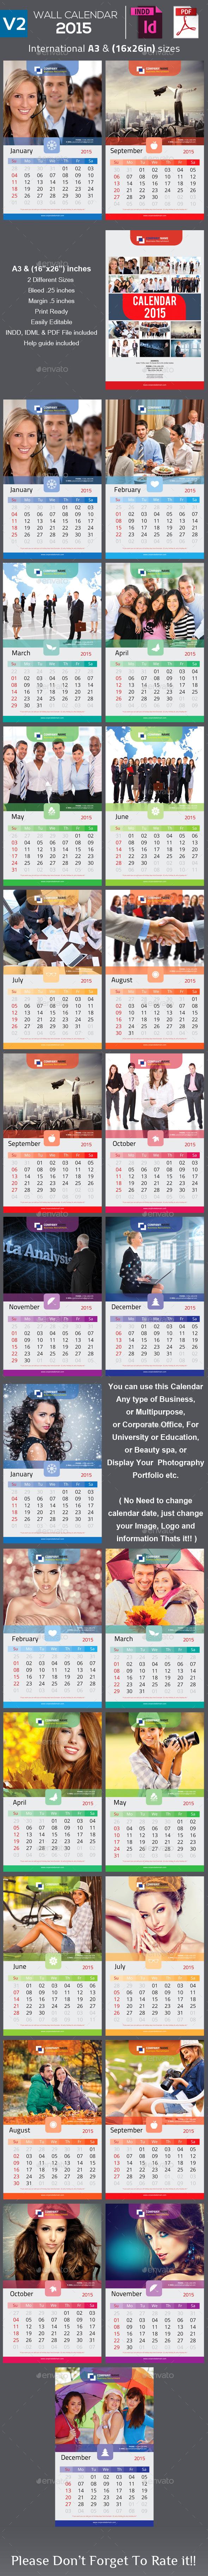 Clean Wall Calendar 2015 V2 - Calendars Stationery